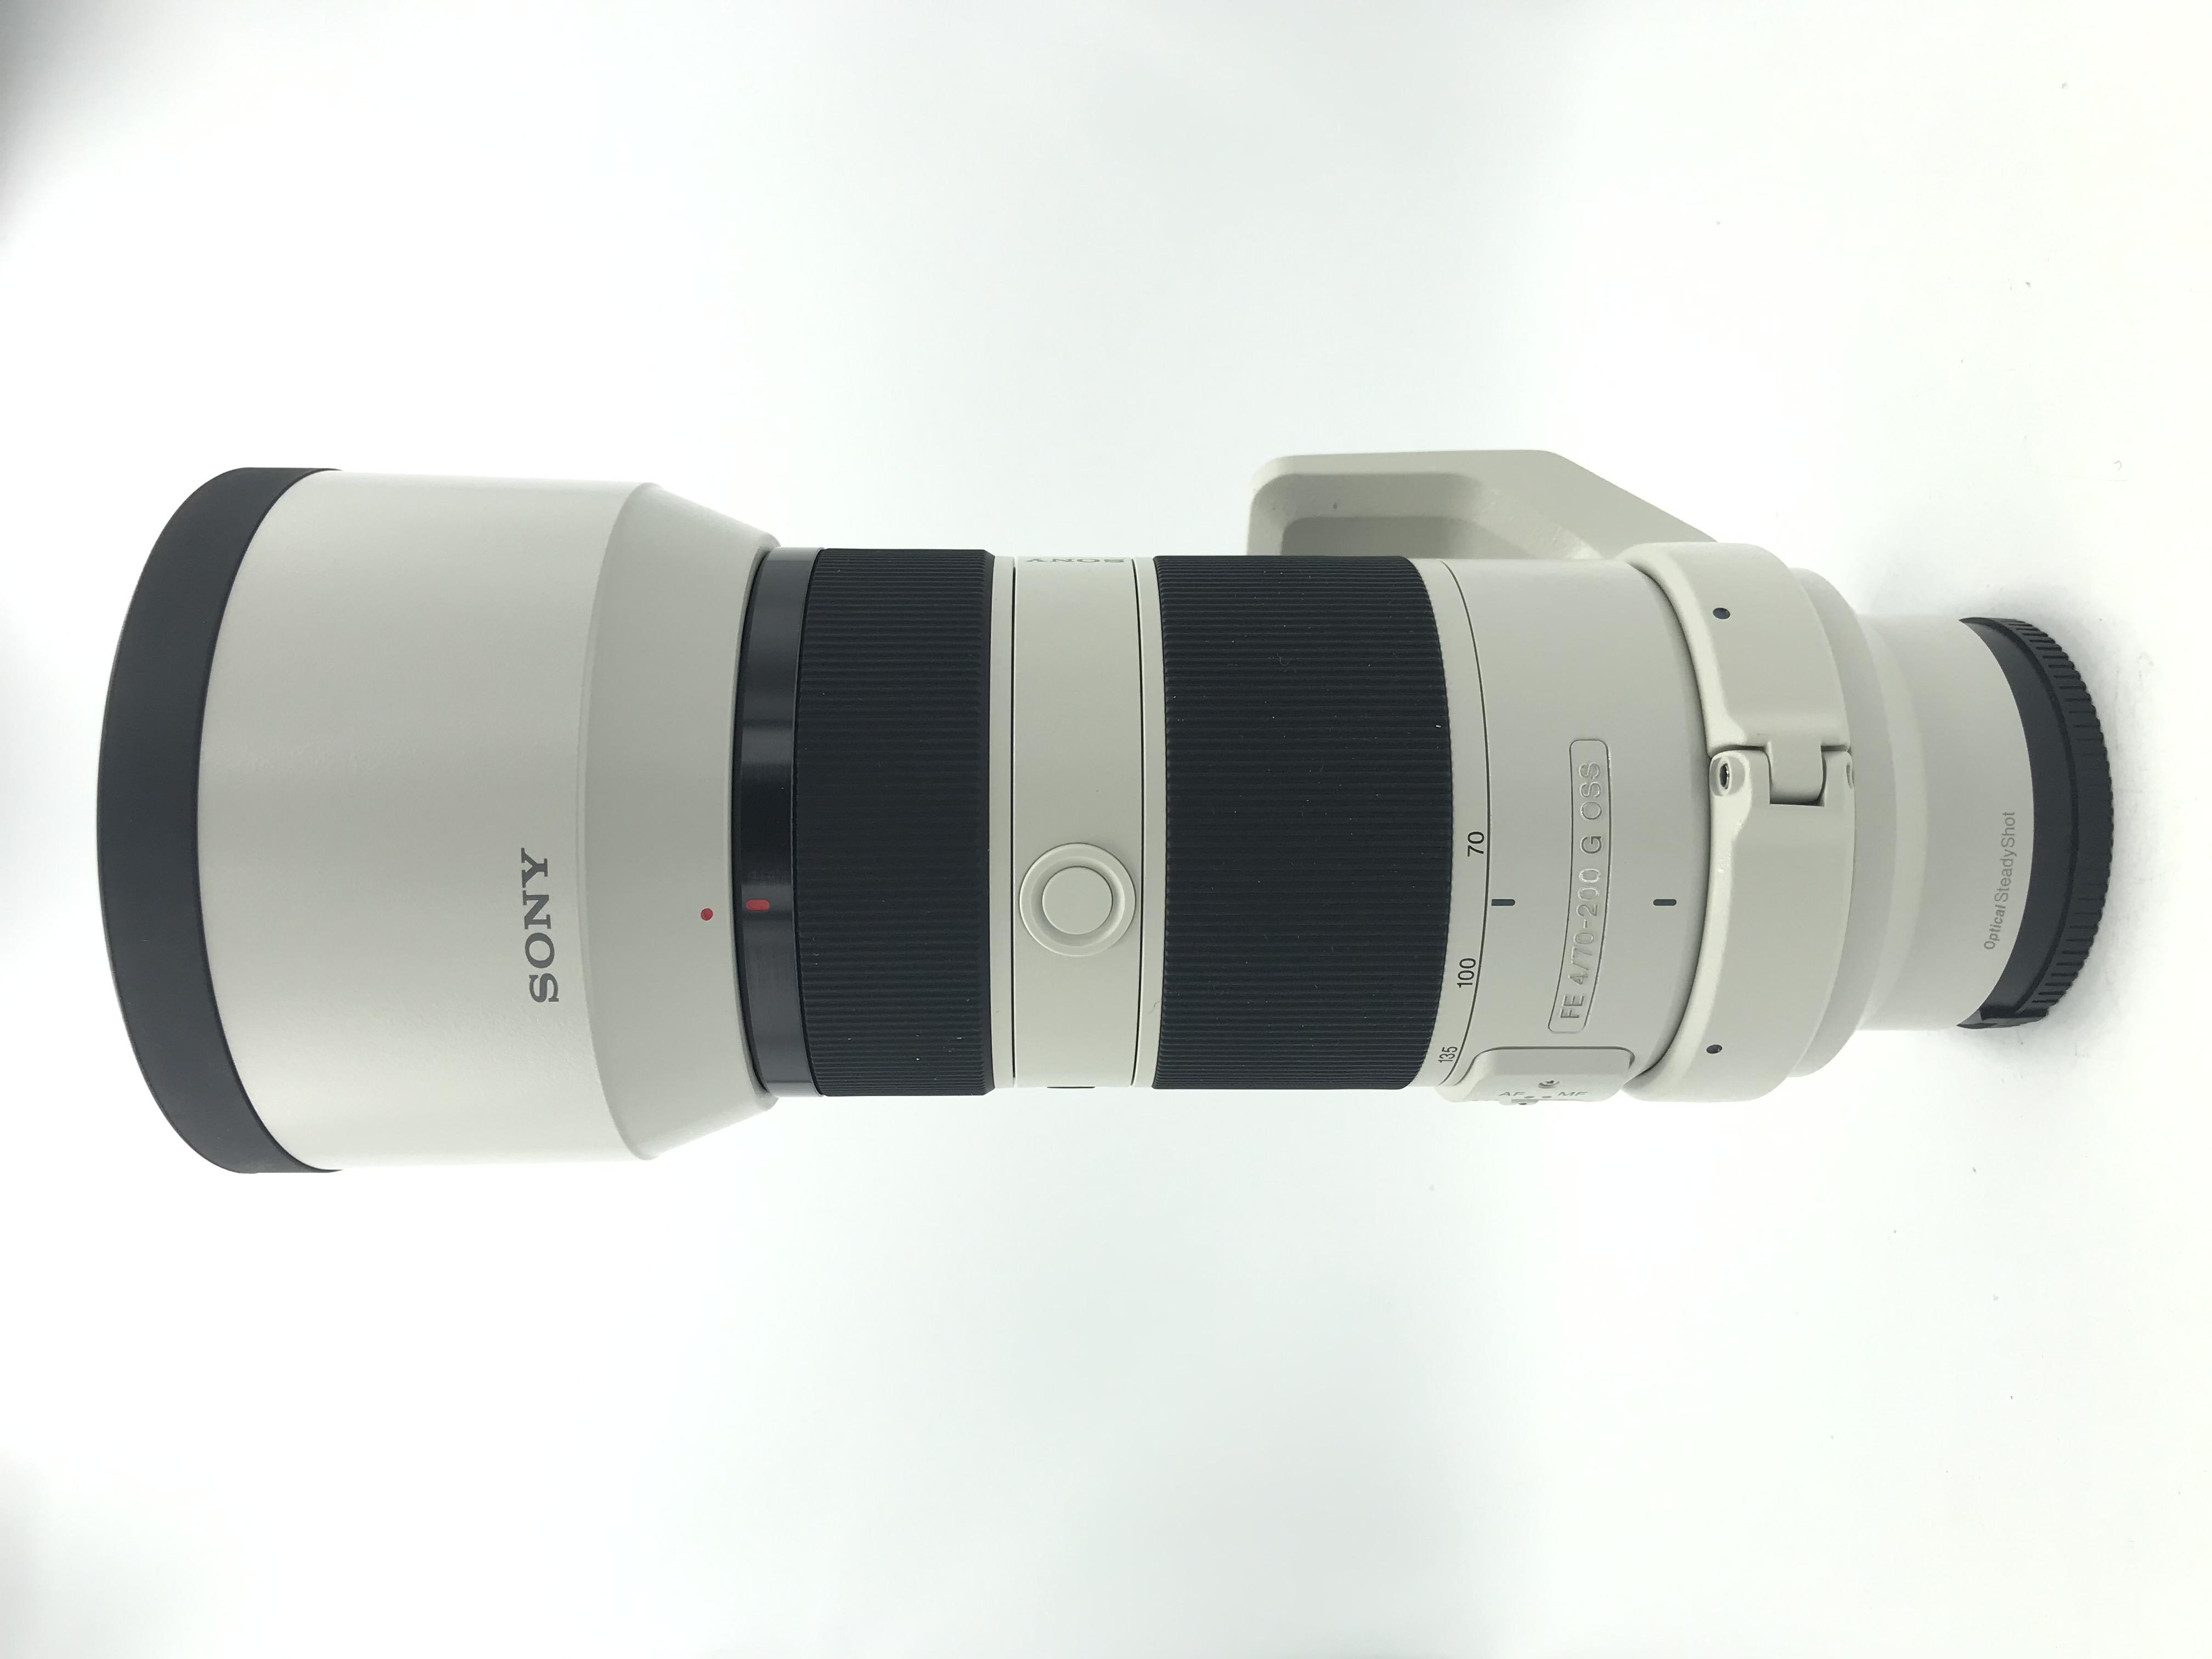 USED Sony 24mm F1.4 GM Lens